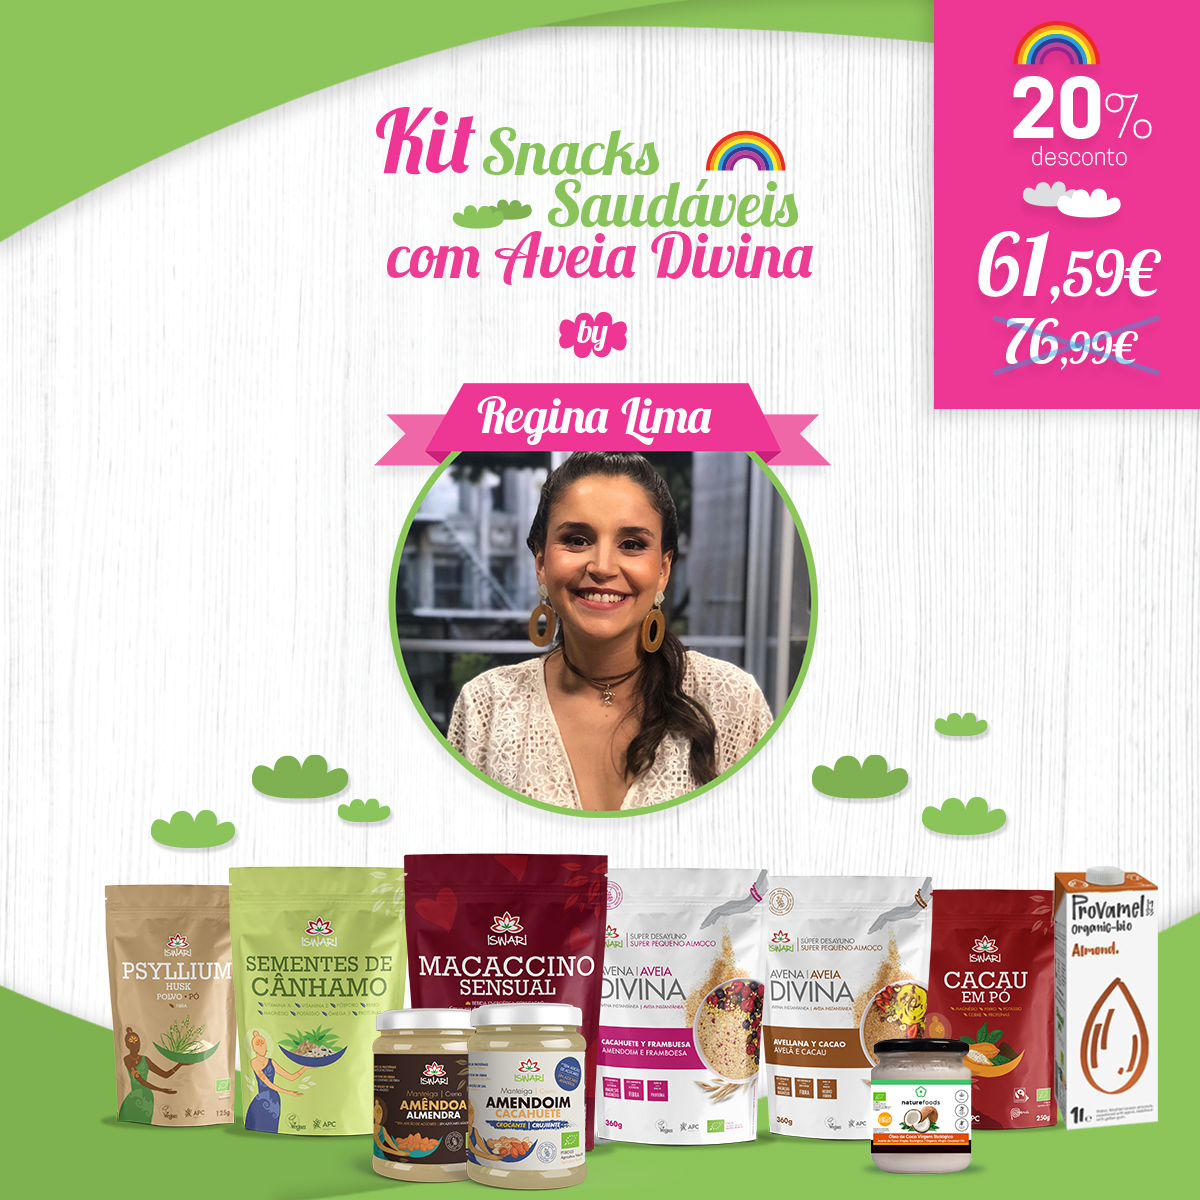 Kit Snacks Saudáveis Aveia Divina by Regina Lima 1